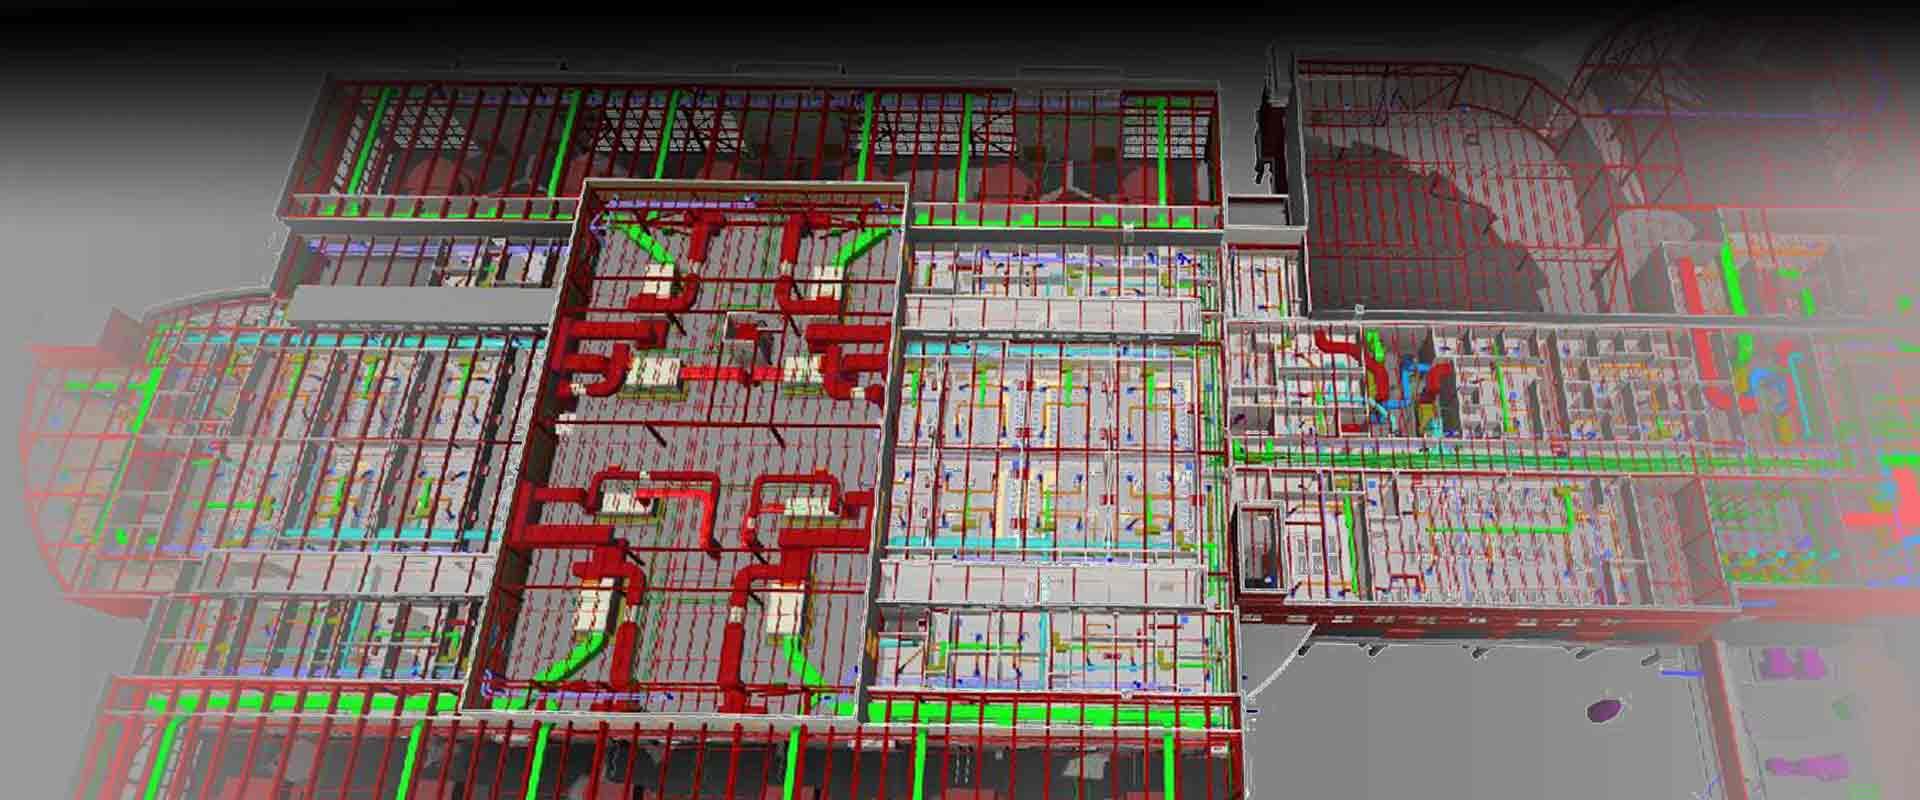 Bim Hvac Services Drawing Autocad Model